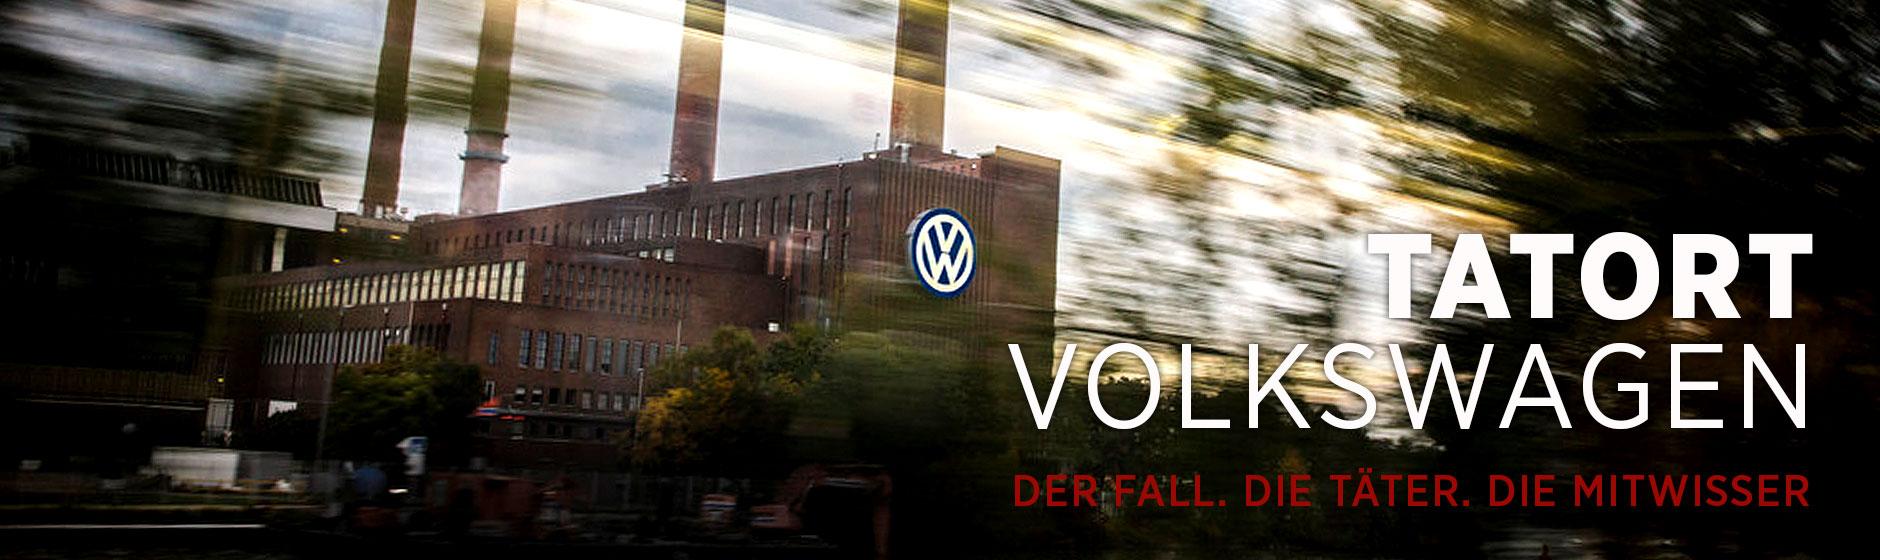 Handelsblatt Volkswagen Special